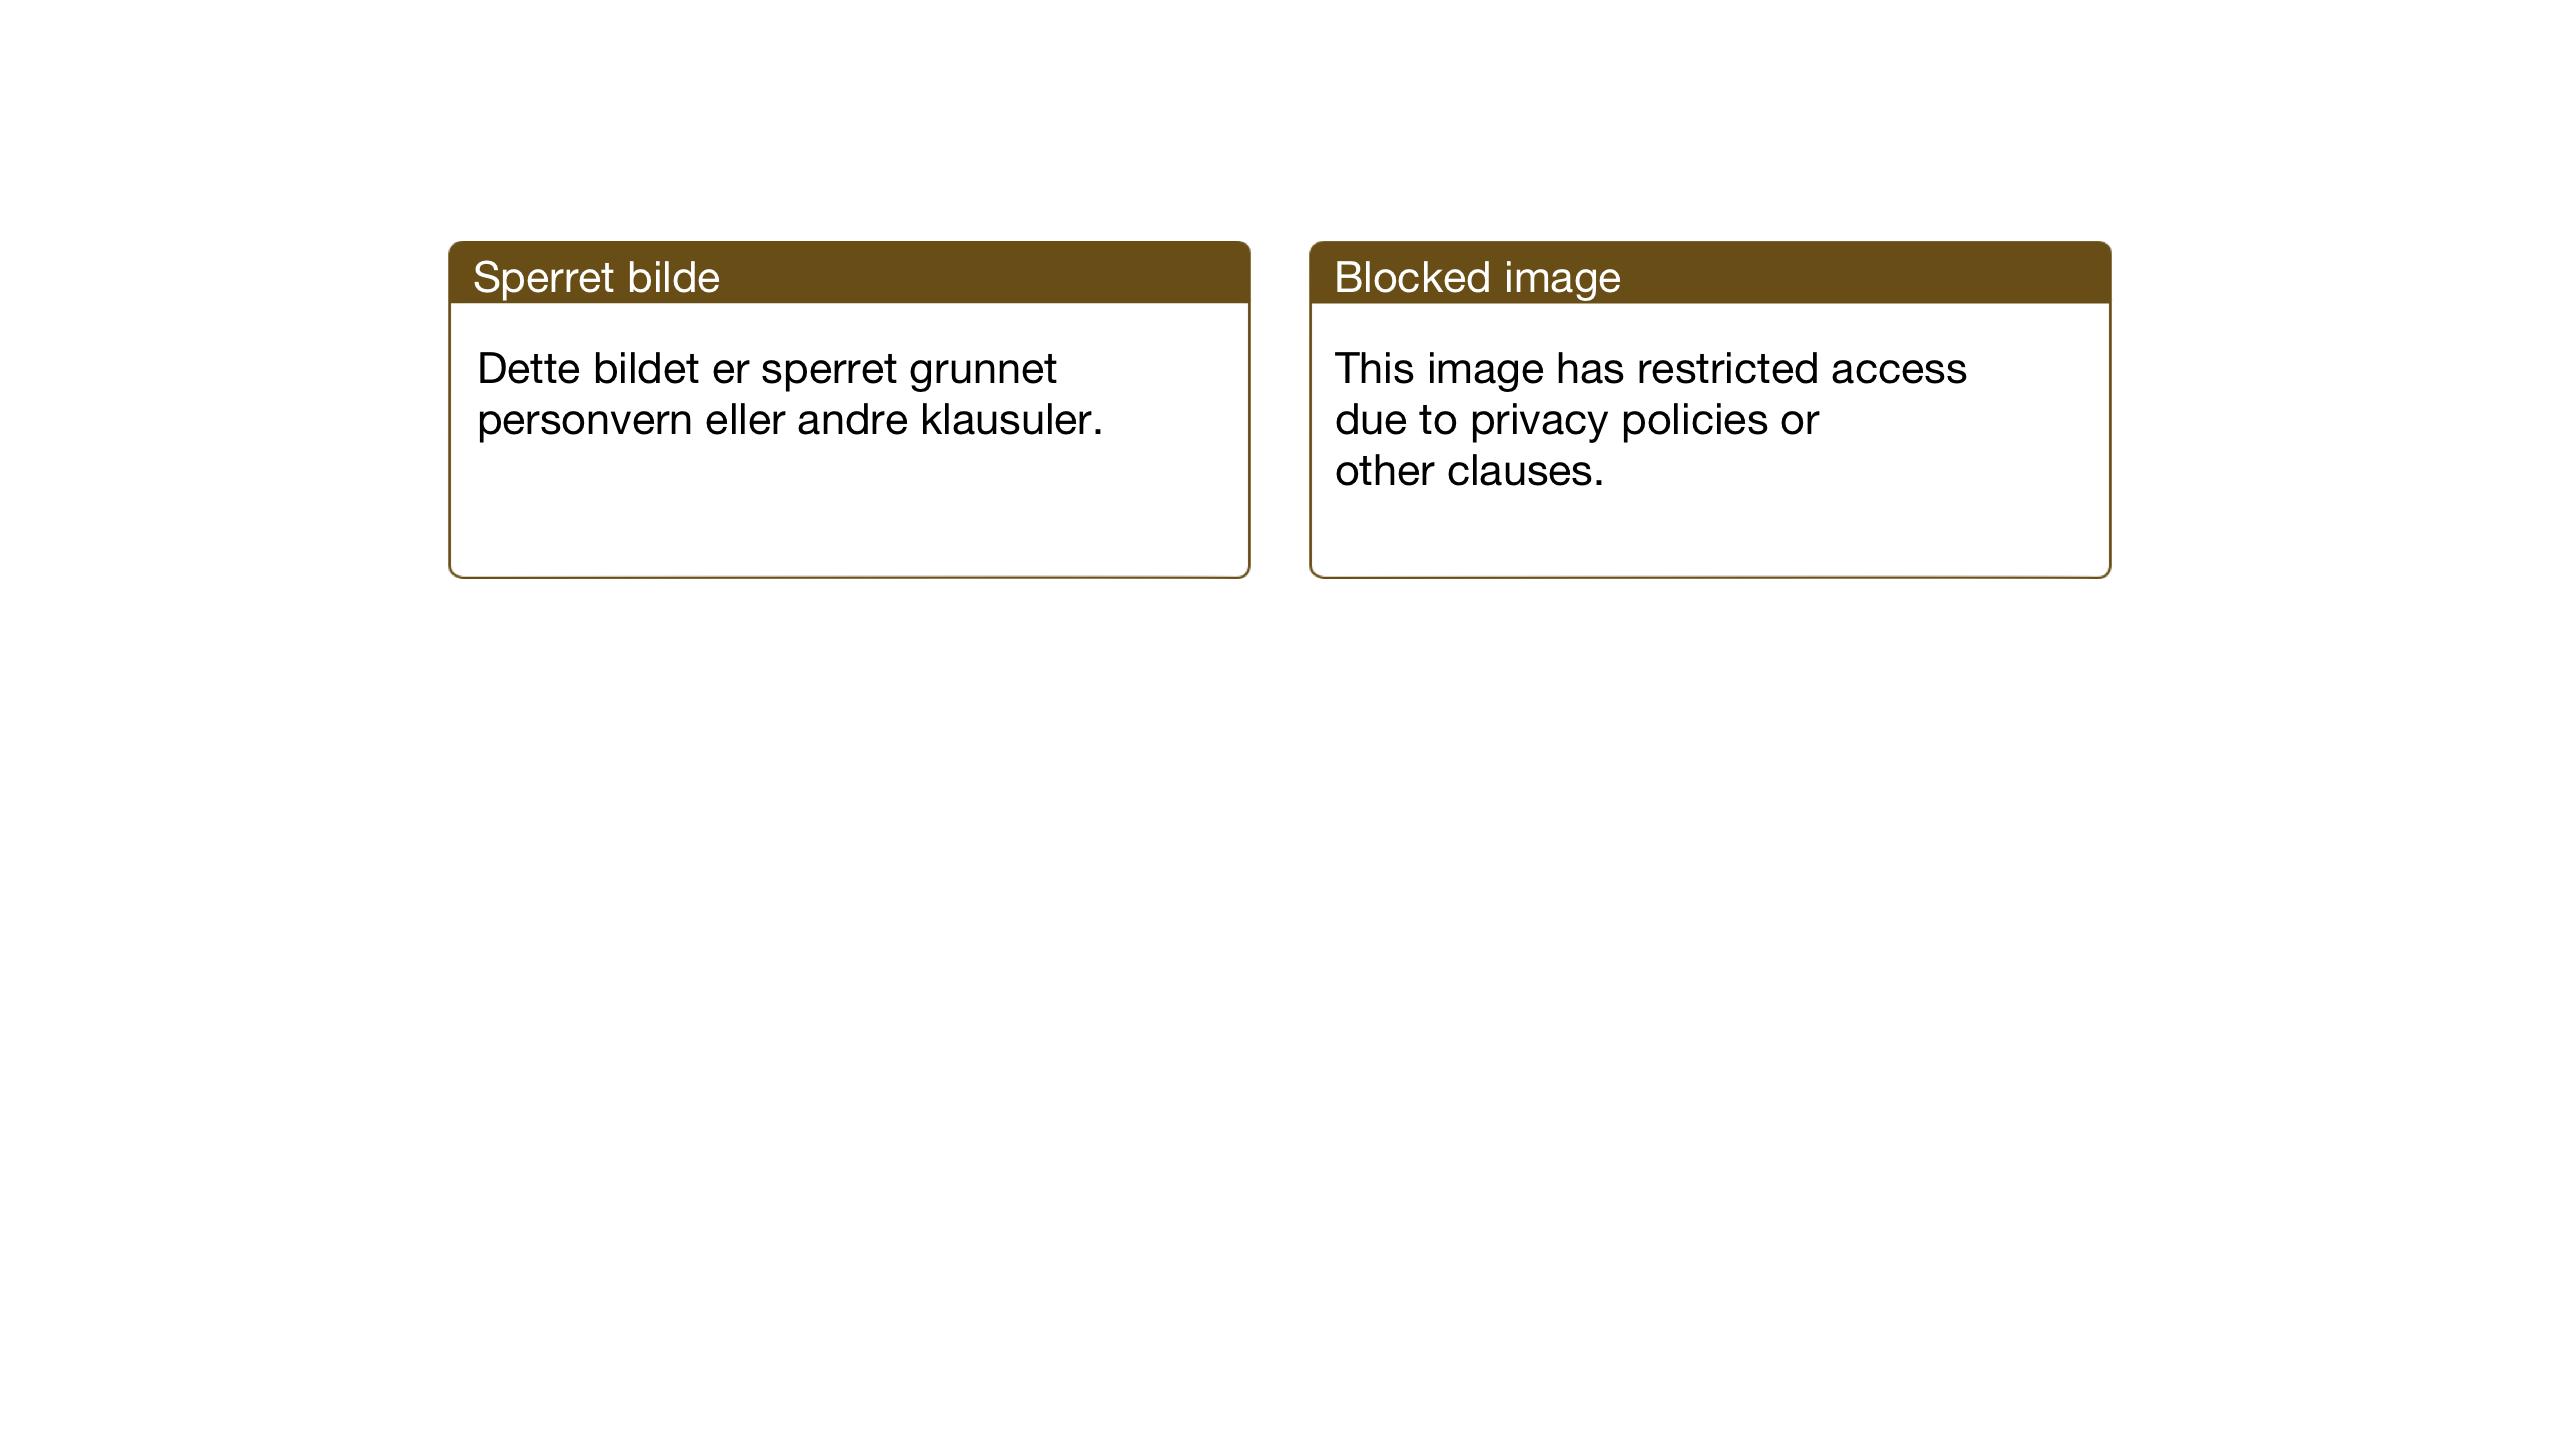 SAT, Ministerialprotokoller, klokkerbøker og fødselsregistre - Nordland, 847/L0680: Klokkerbok nr. 847C08, 1930-1947, s. 81